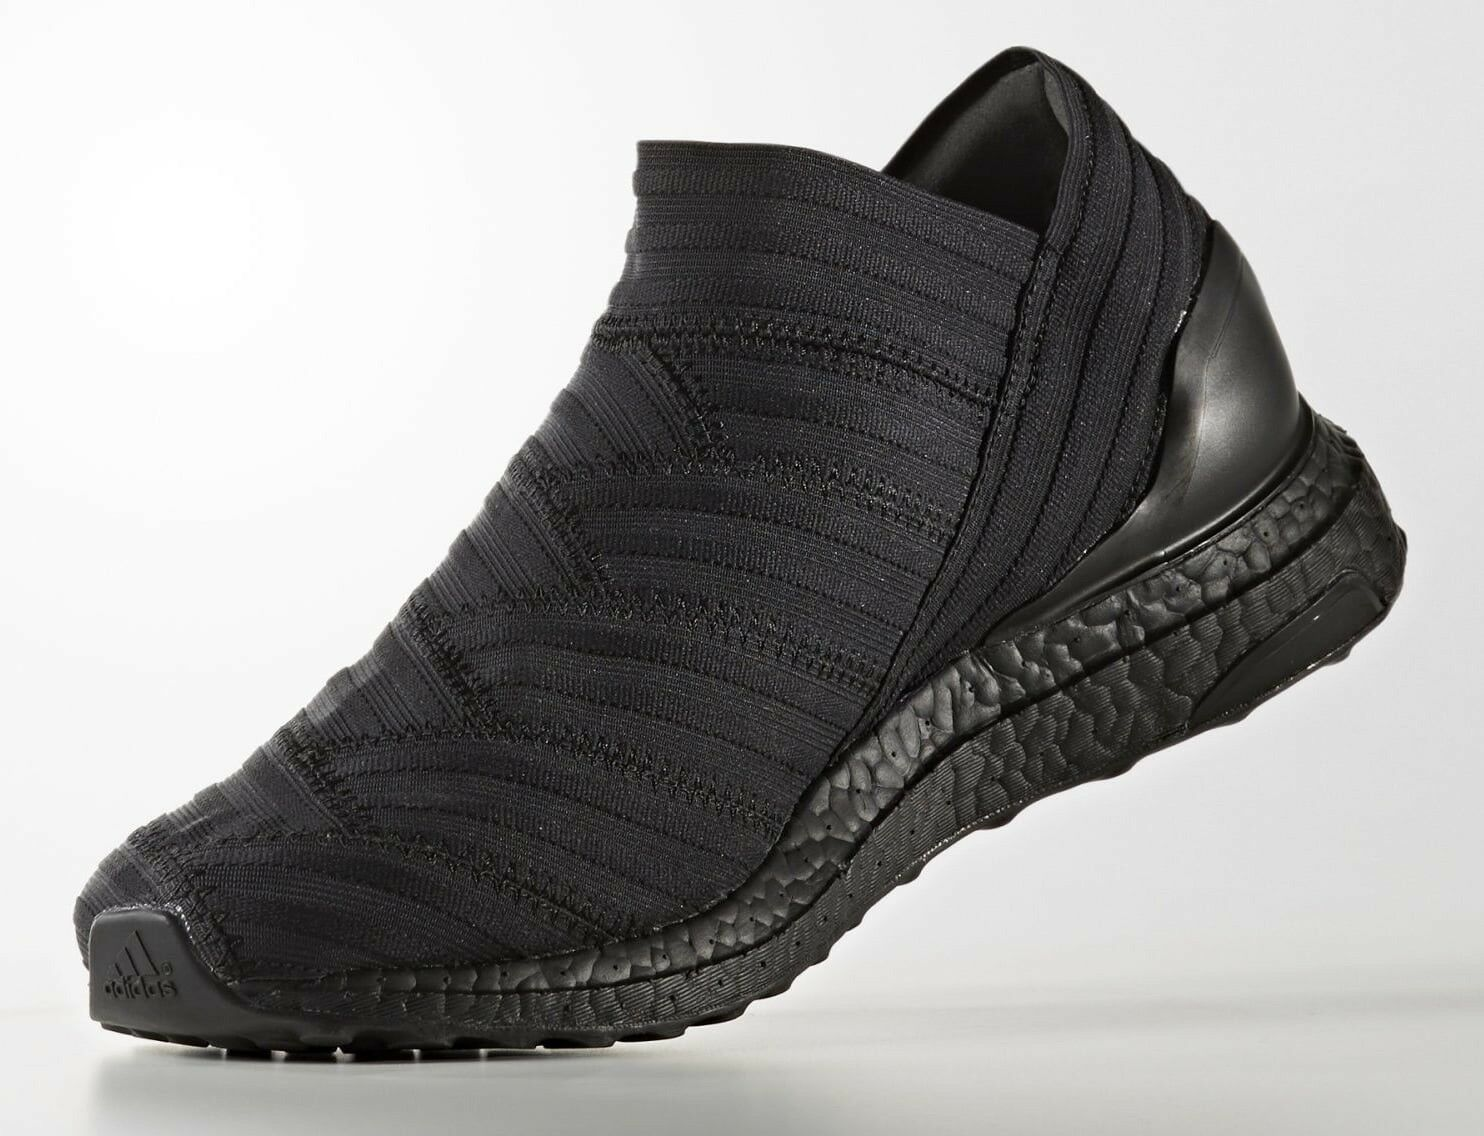 Adidas Nemeziz Tango 17 360 Agility Uk 7.5 boost triple black